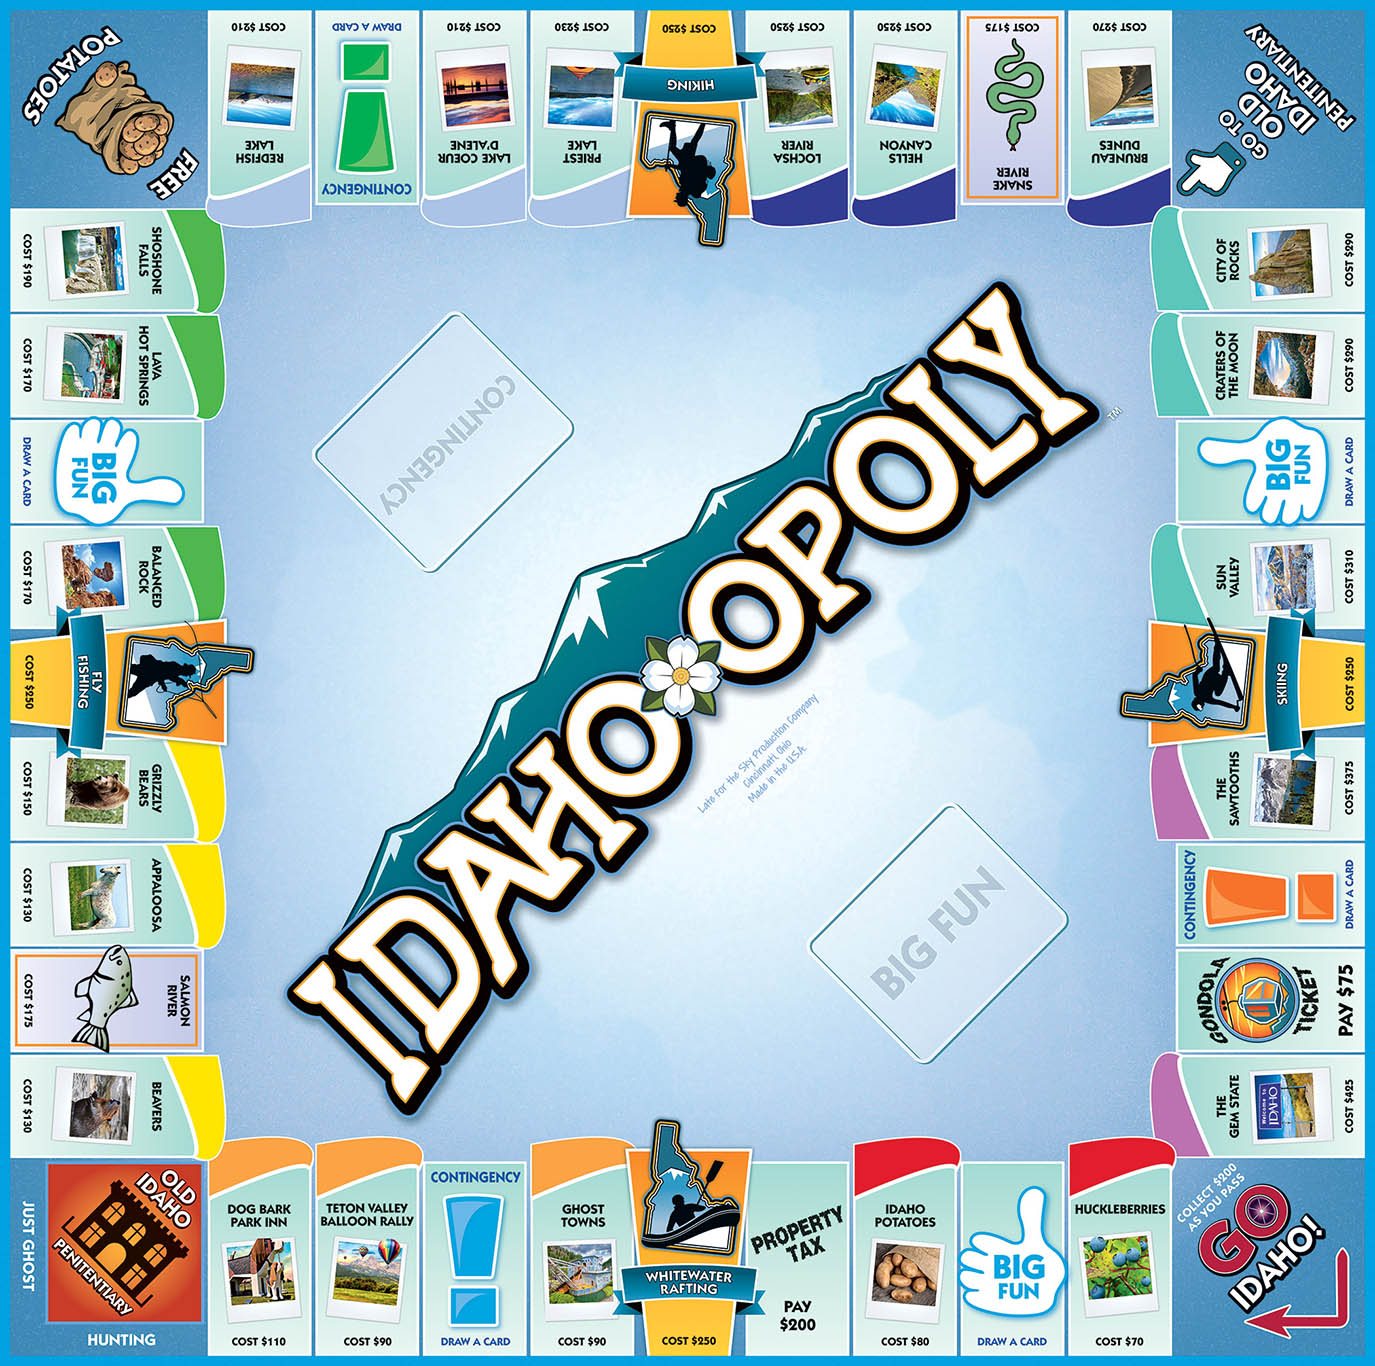 IDAHO-OPOLY Board Game